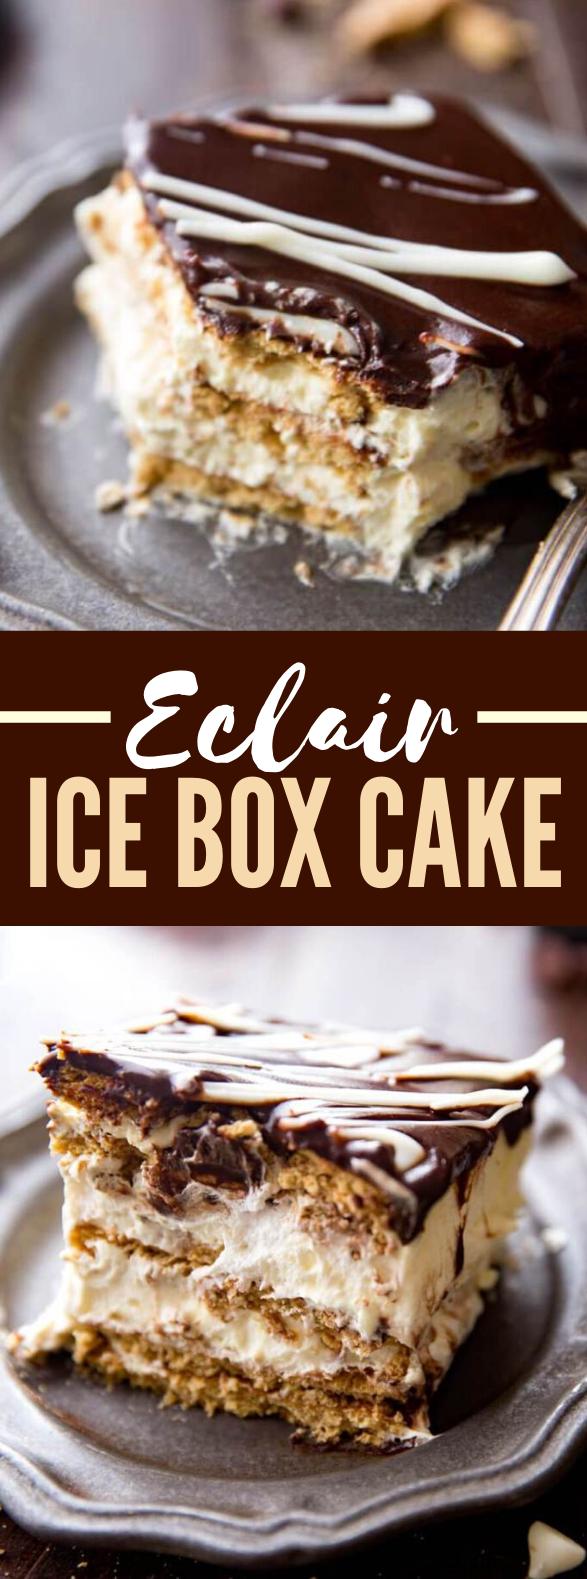 Eclair Ice Box Cake #desserts #crackers